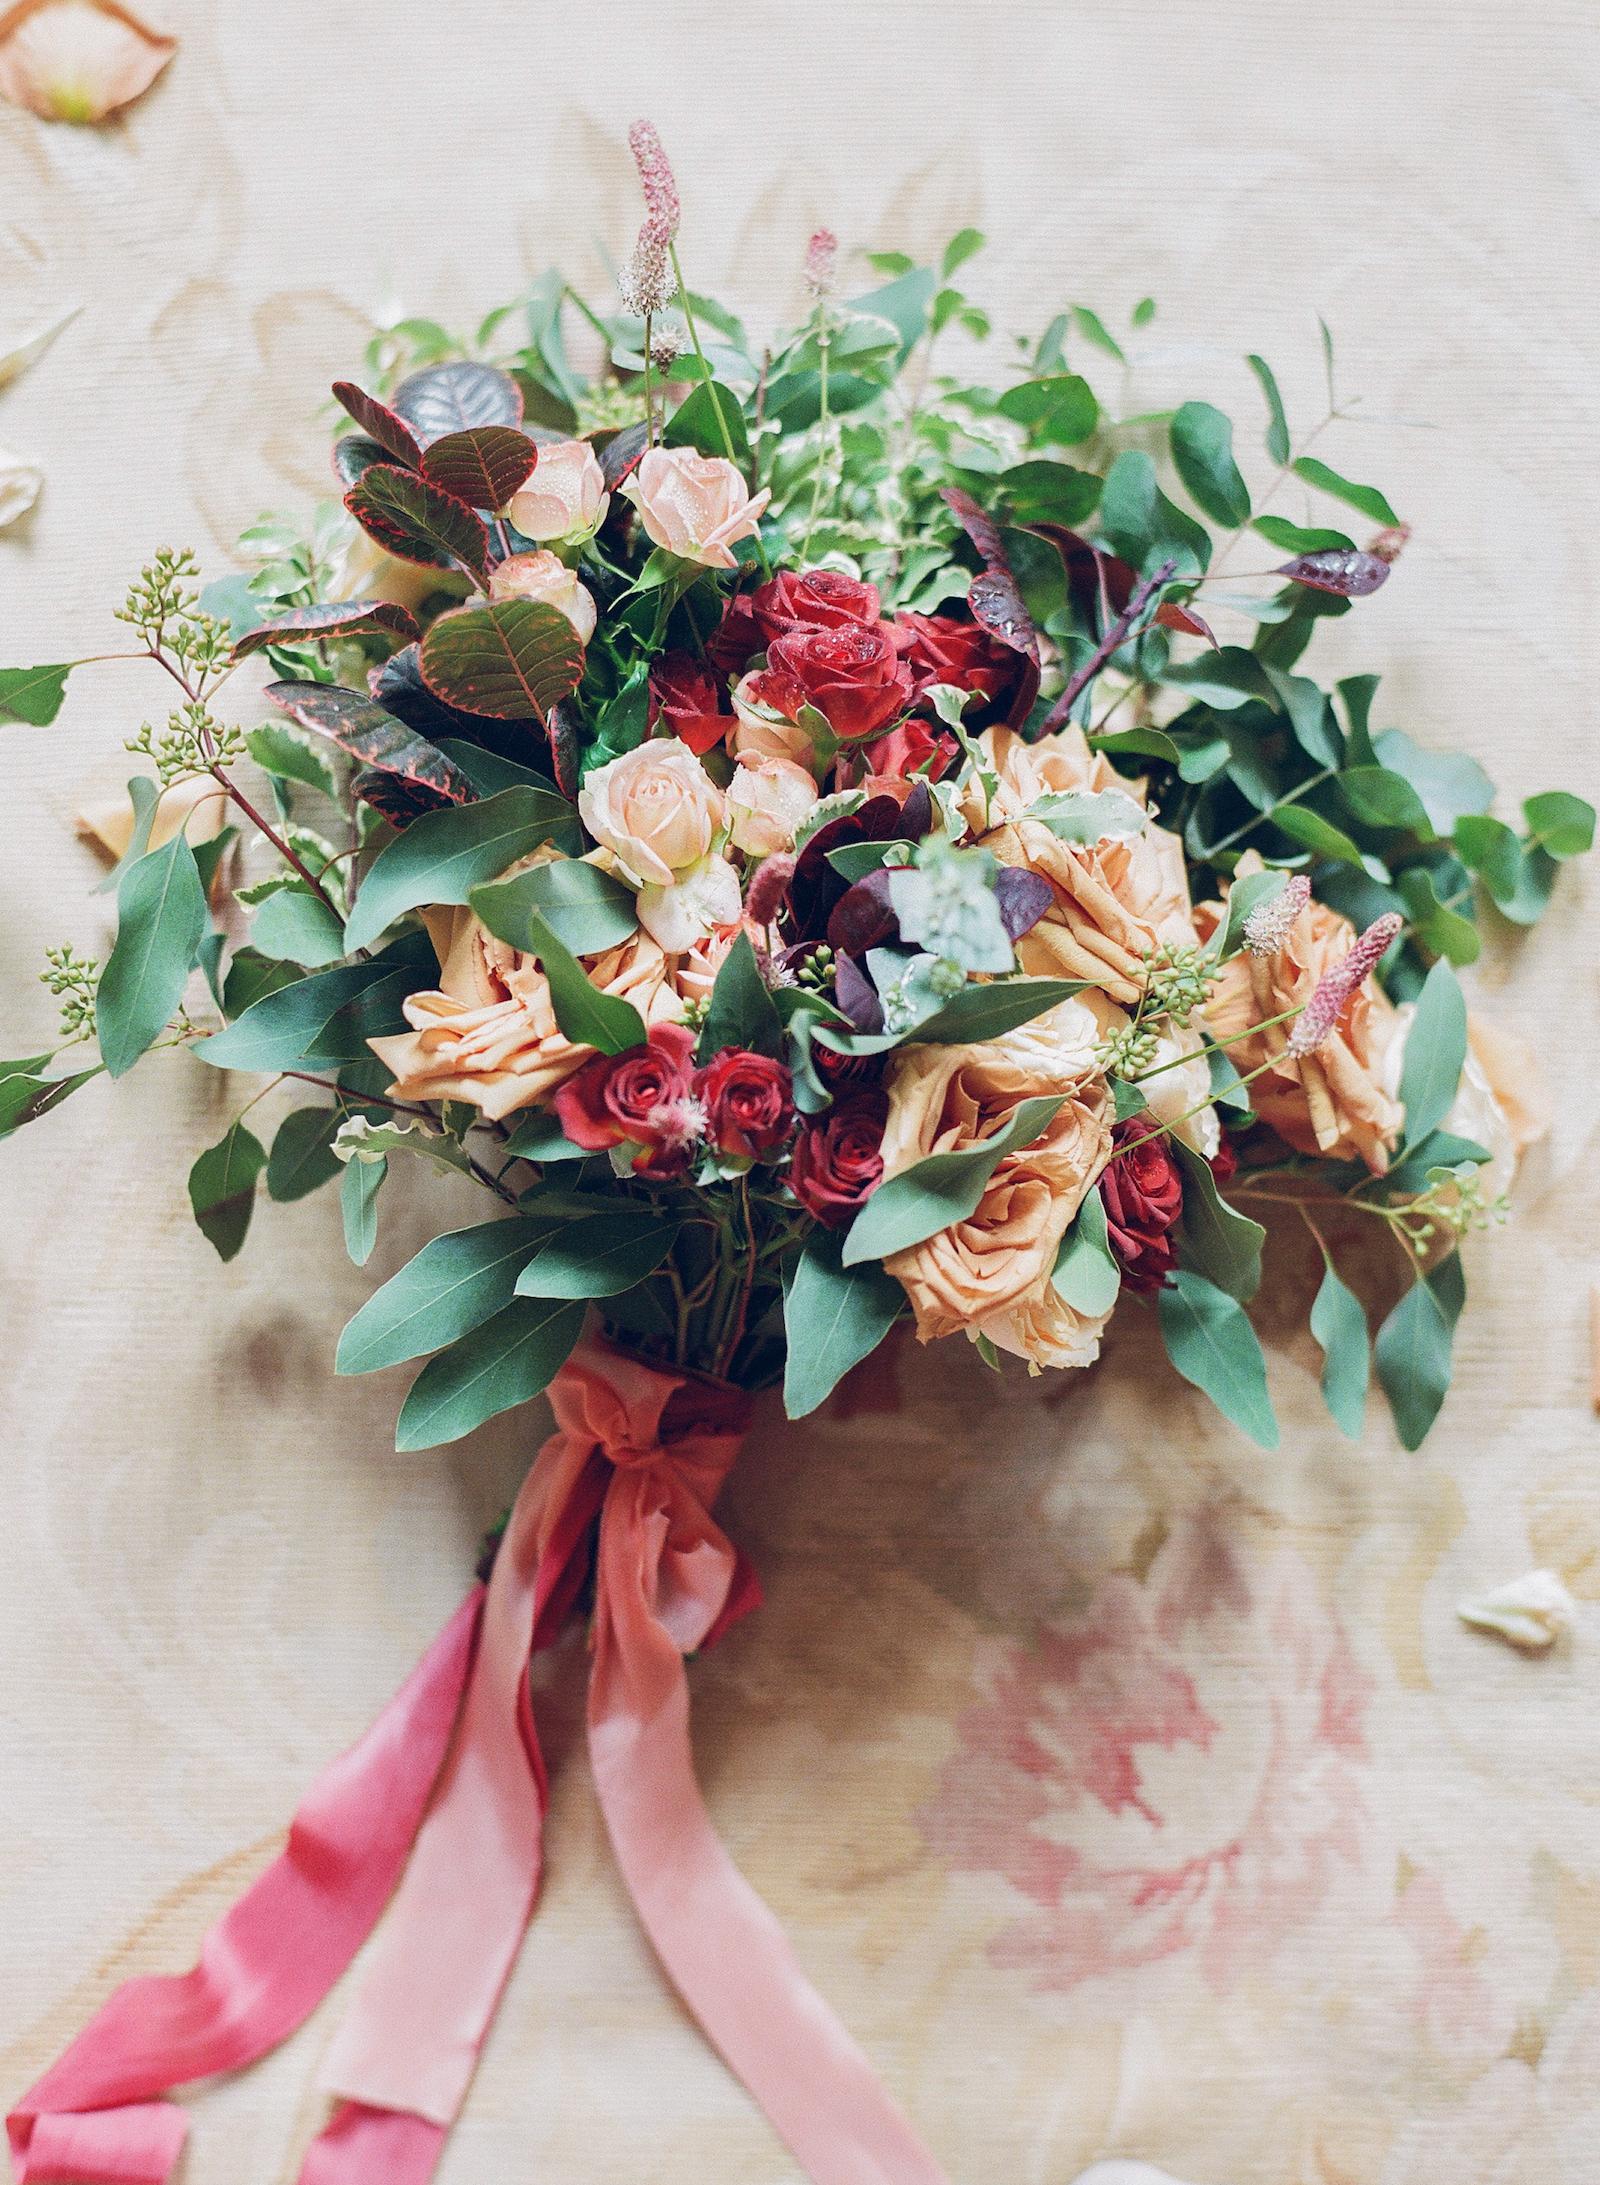 Luxury Wedding Planner UK, London & Europe | A Feminine & Refined Autumn Wedding Inspiration | English Manor Country Autumn Wedding Moody Romantic Warm Velvet Black Red and Peach Tones | Molly Carr Photography74.JPG